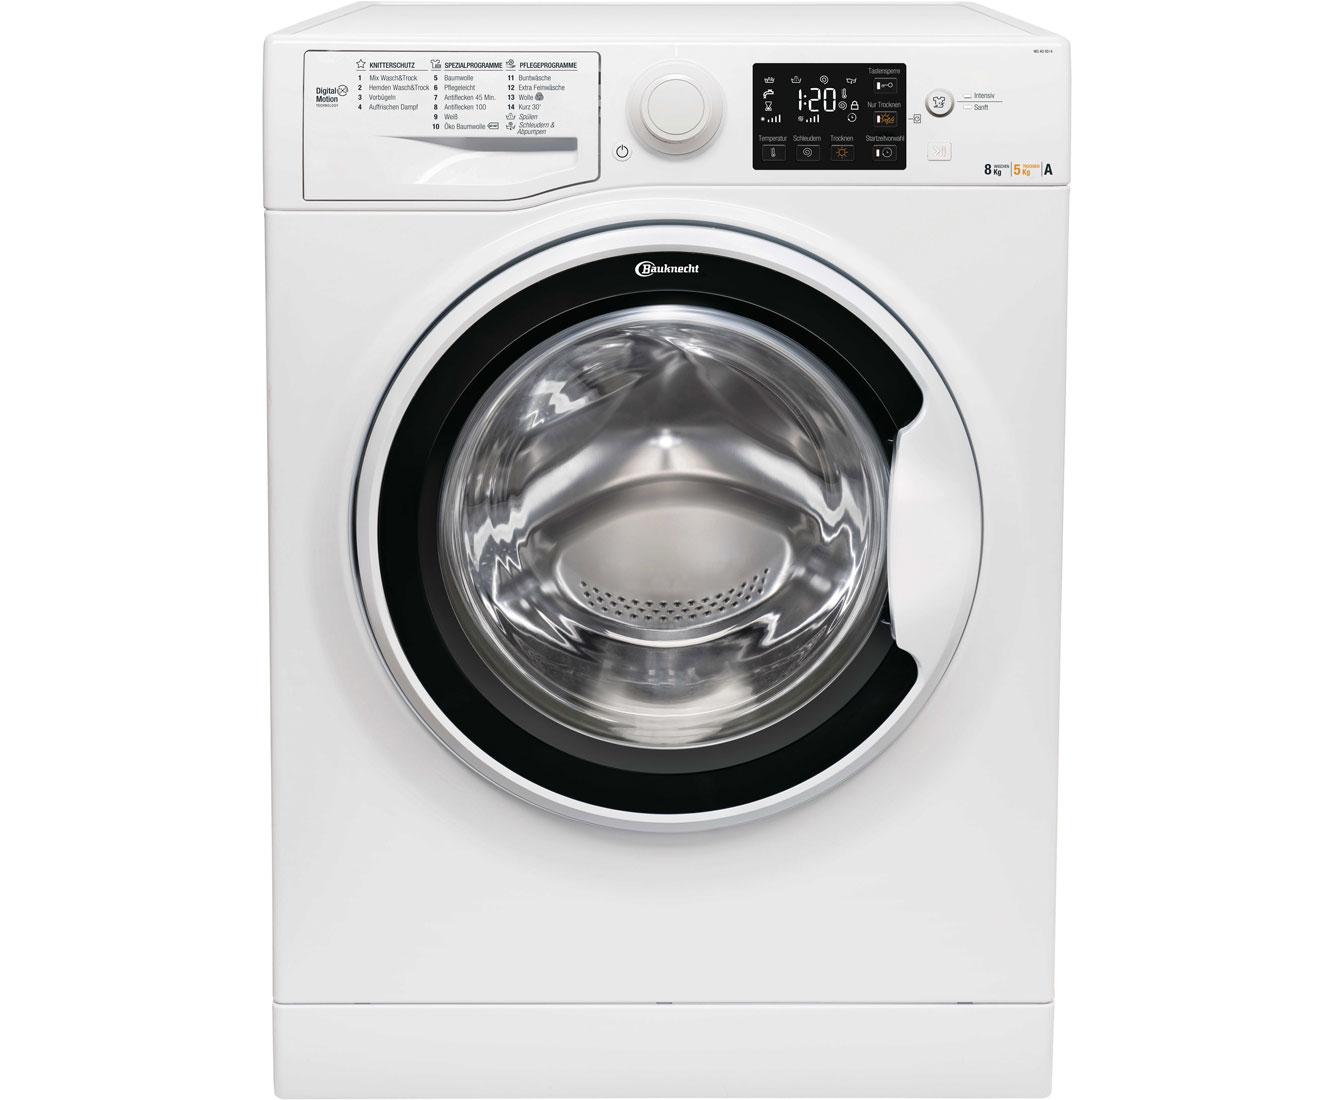 Bauknecht wd ao 8514 waschtrockner 8 kg waschen 5 kg trocknen